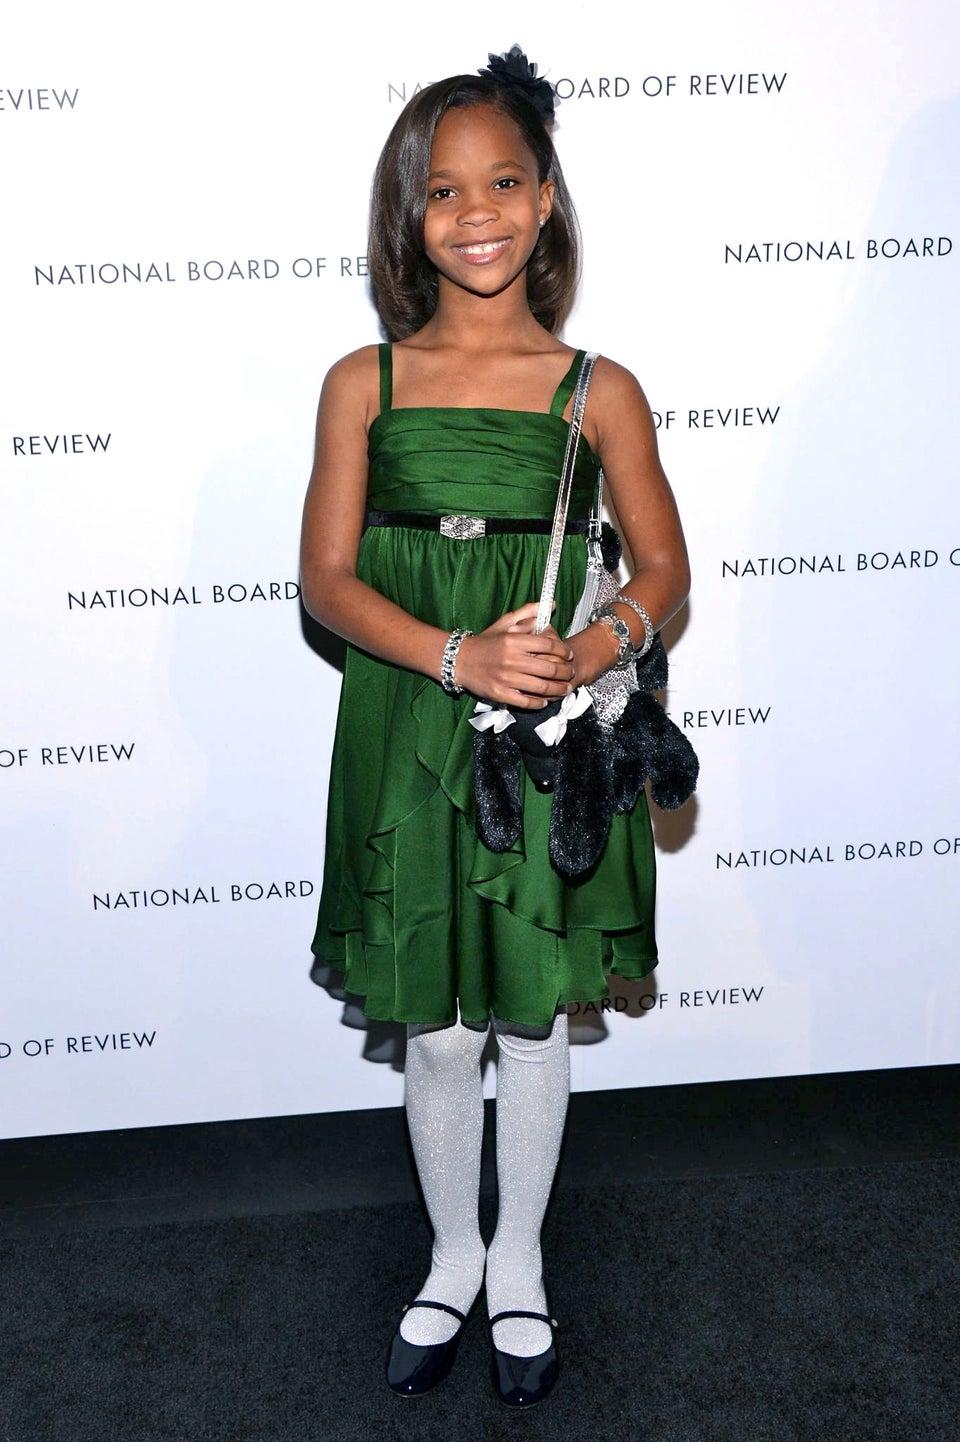 Quvenzhane Wallis Wins Best Young Actress Critics Choice Award